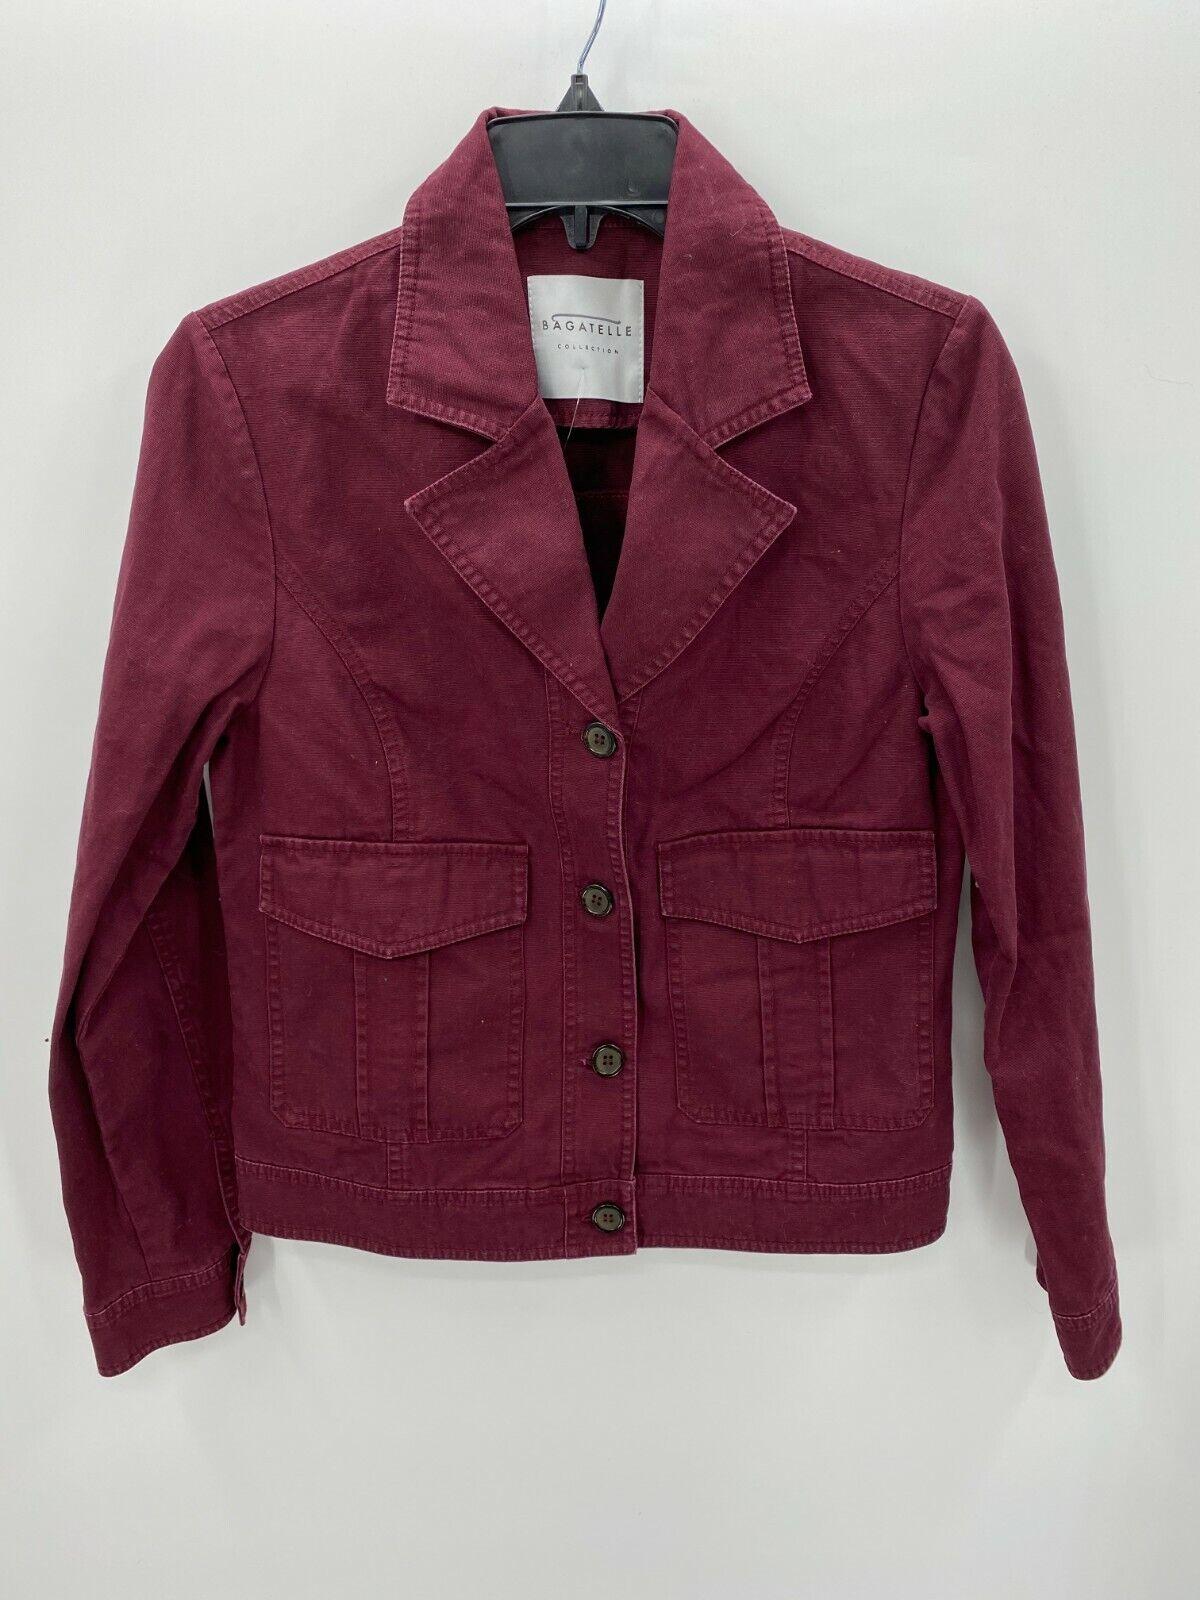 Bagatelle Collection Womens Medium Maroon Denim Jacket Coat Button Up